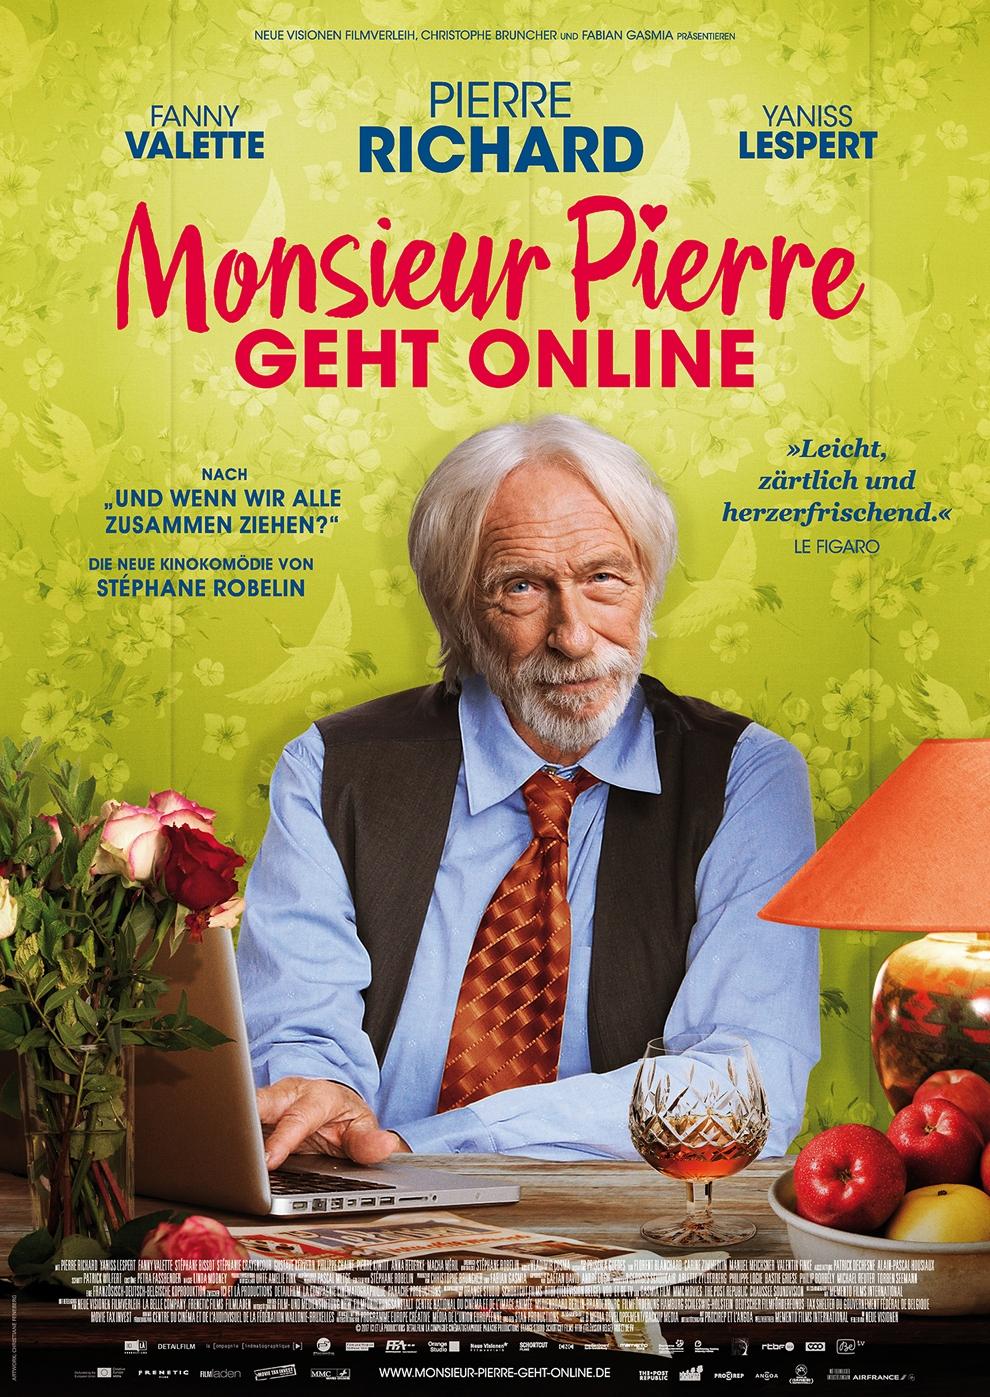 Monsieur Pierre geht online (Poster)